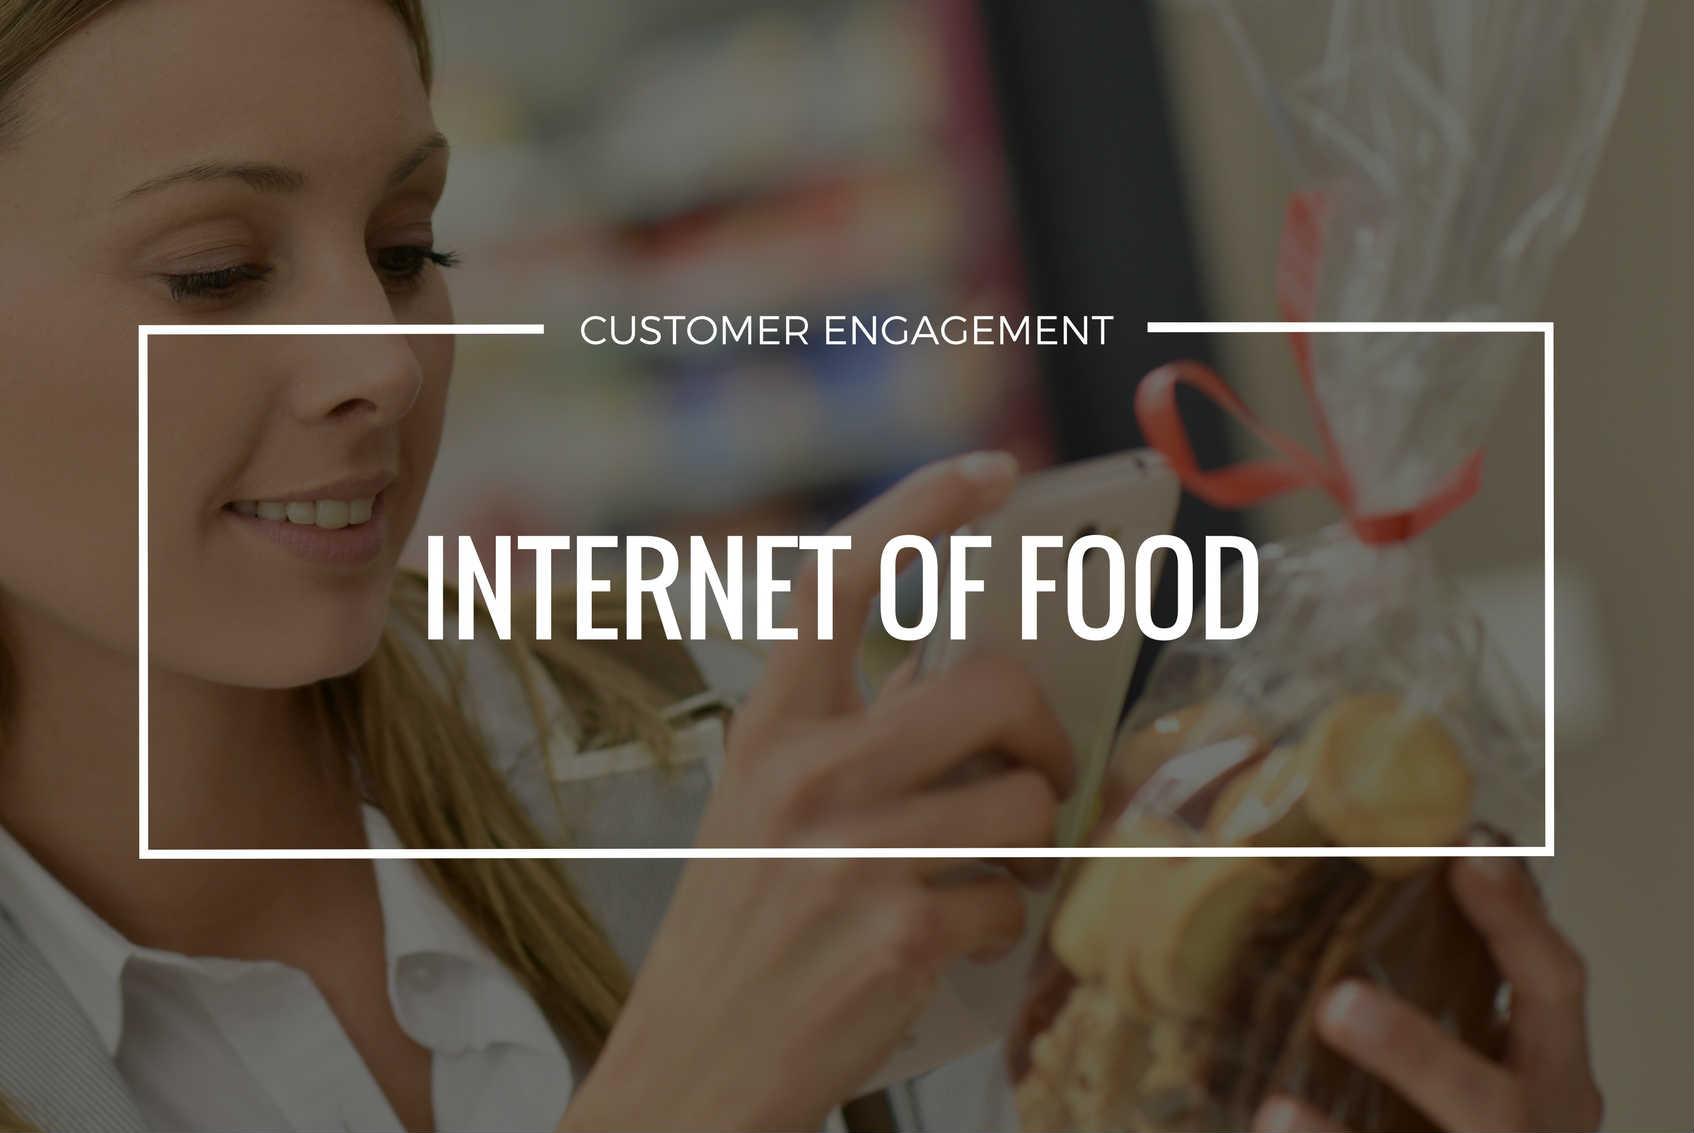 Tracciabilità, Trasparenza, Autenticità:Internet of Food » -